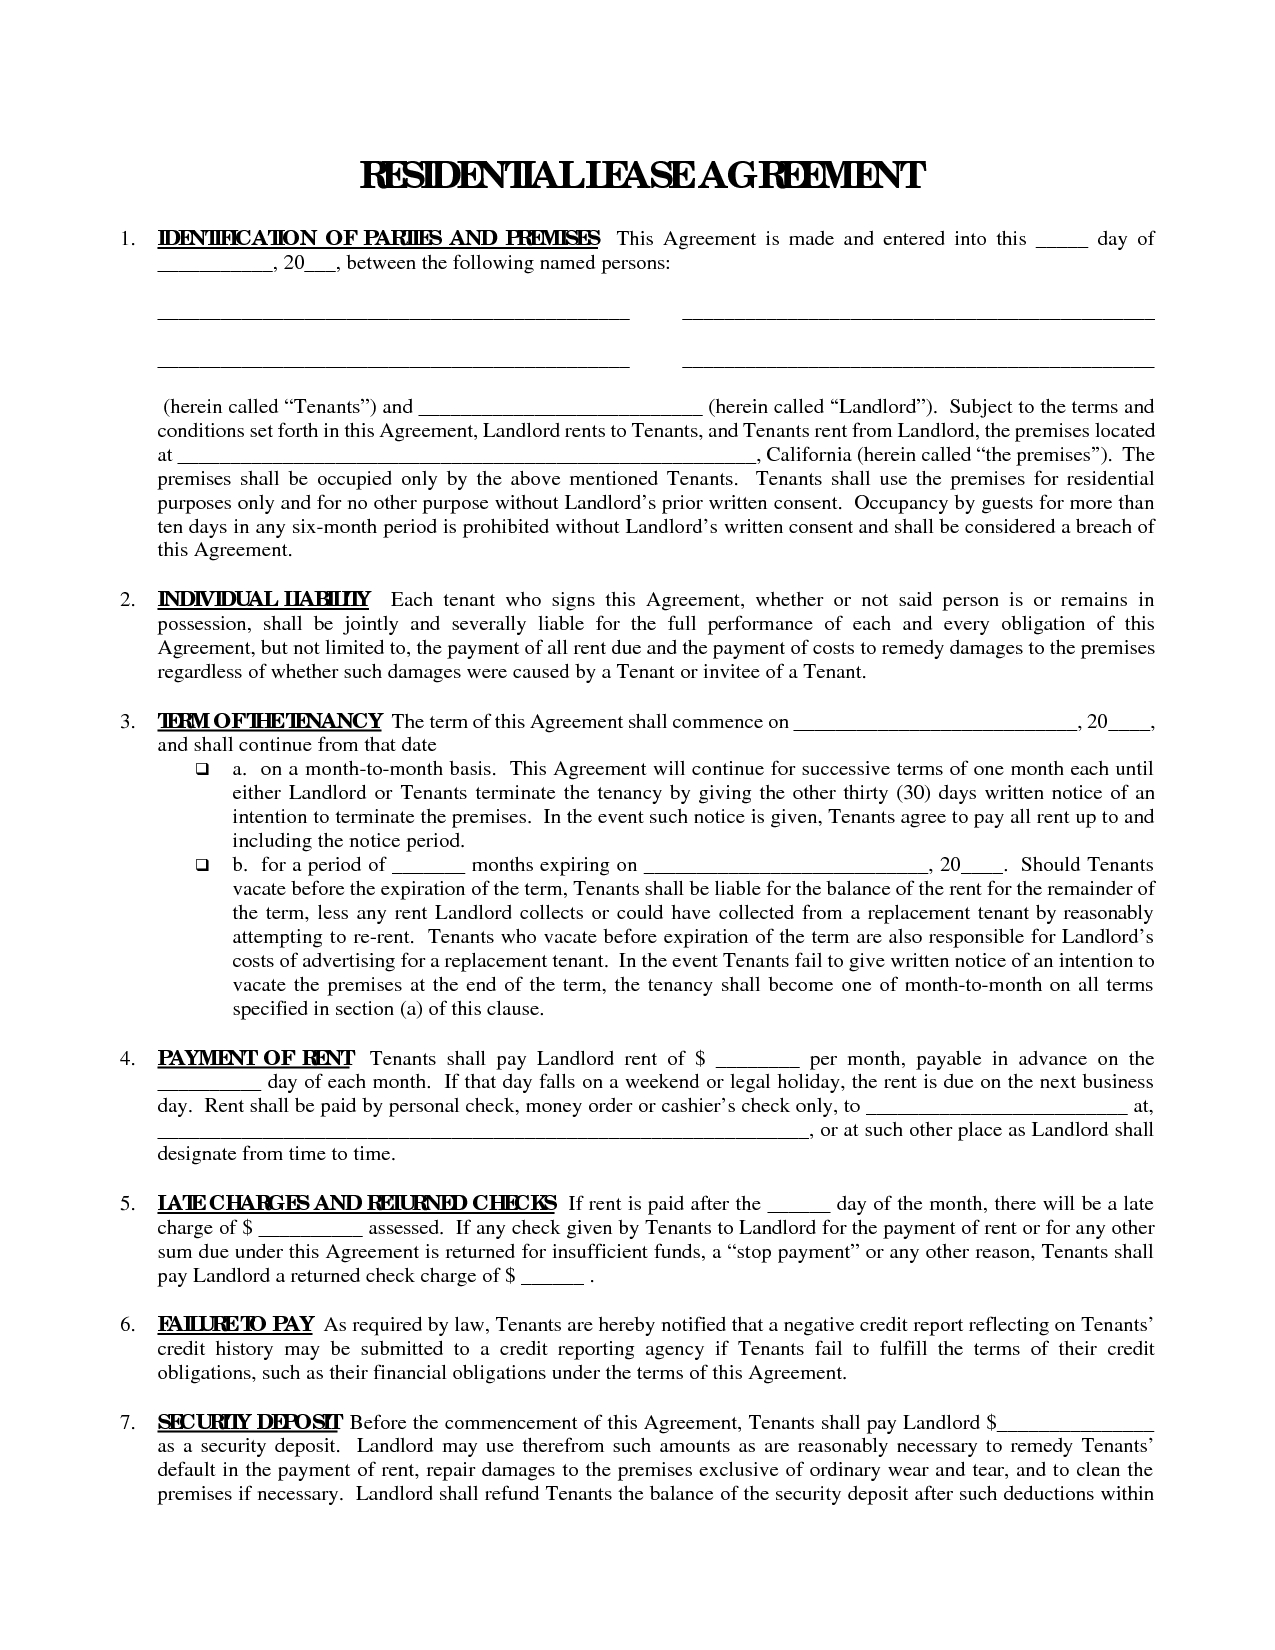 Free Printable Residential Lease Agreement Mi - 2.13.kaartenstemp.nl • - Free Printable Rental Lease Agreement